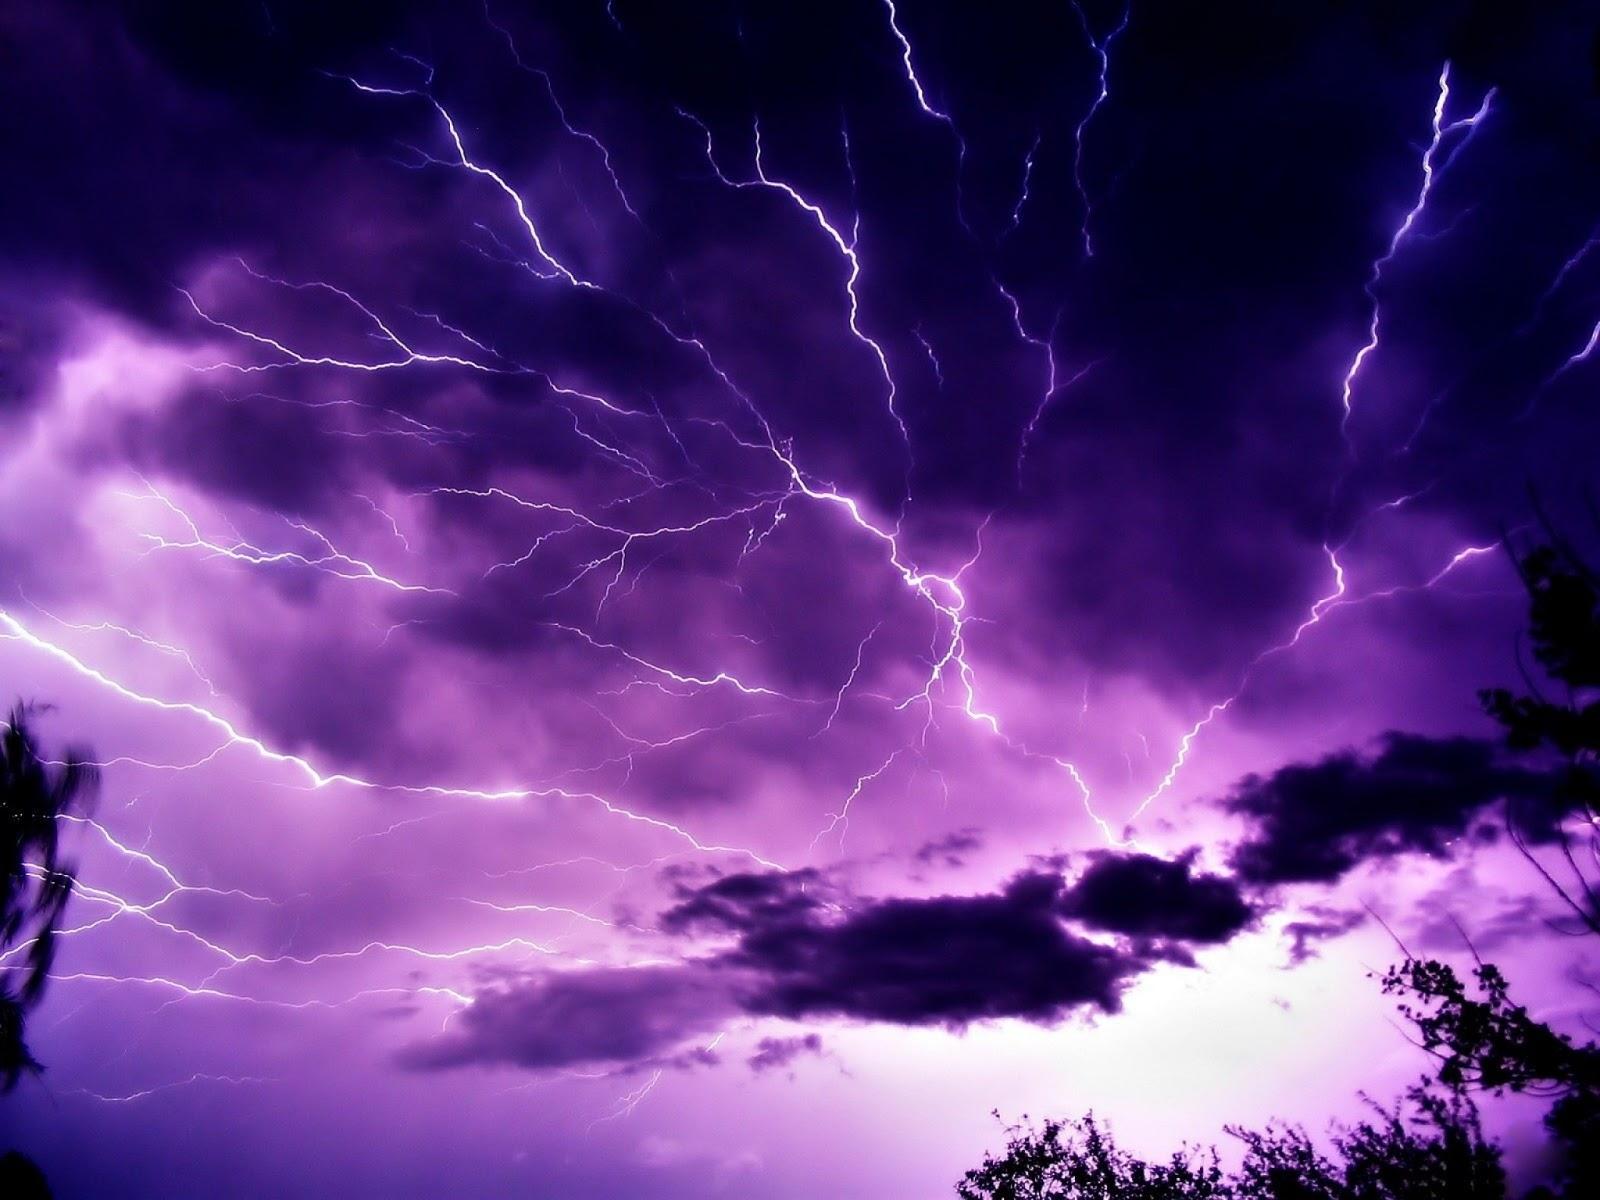 Lightning Wallpapers Hd: Lightning HD Wallpapers